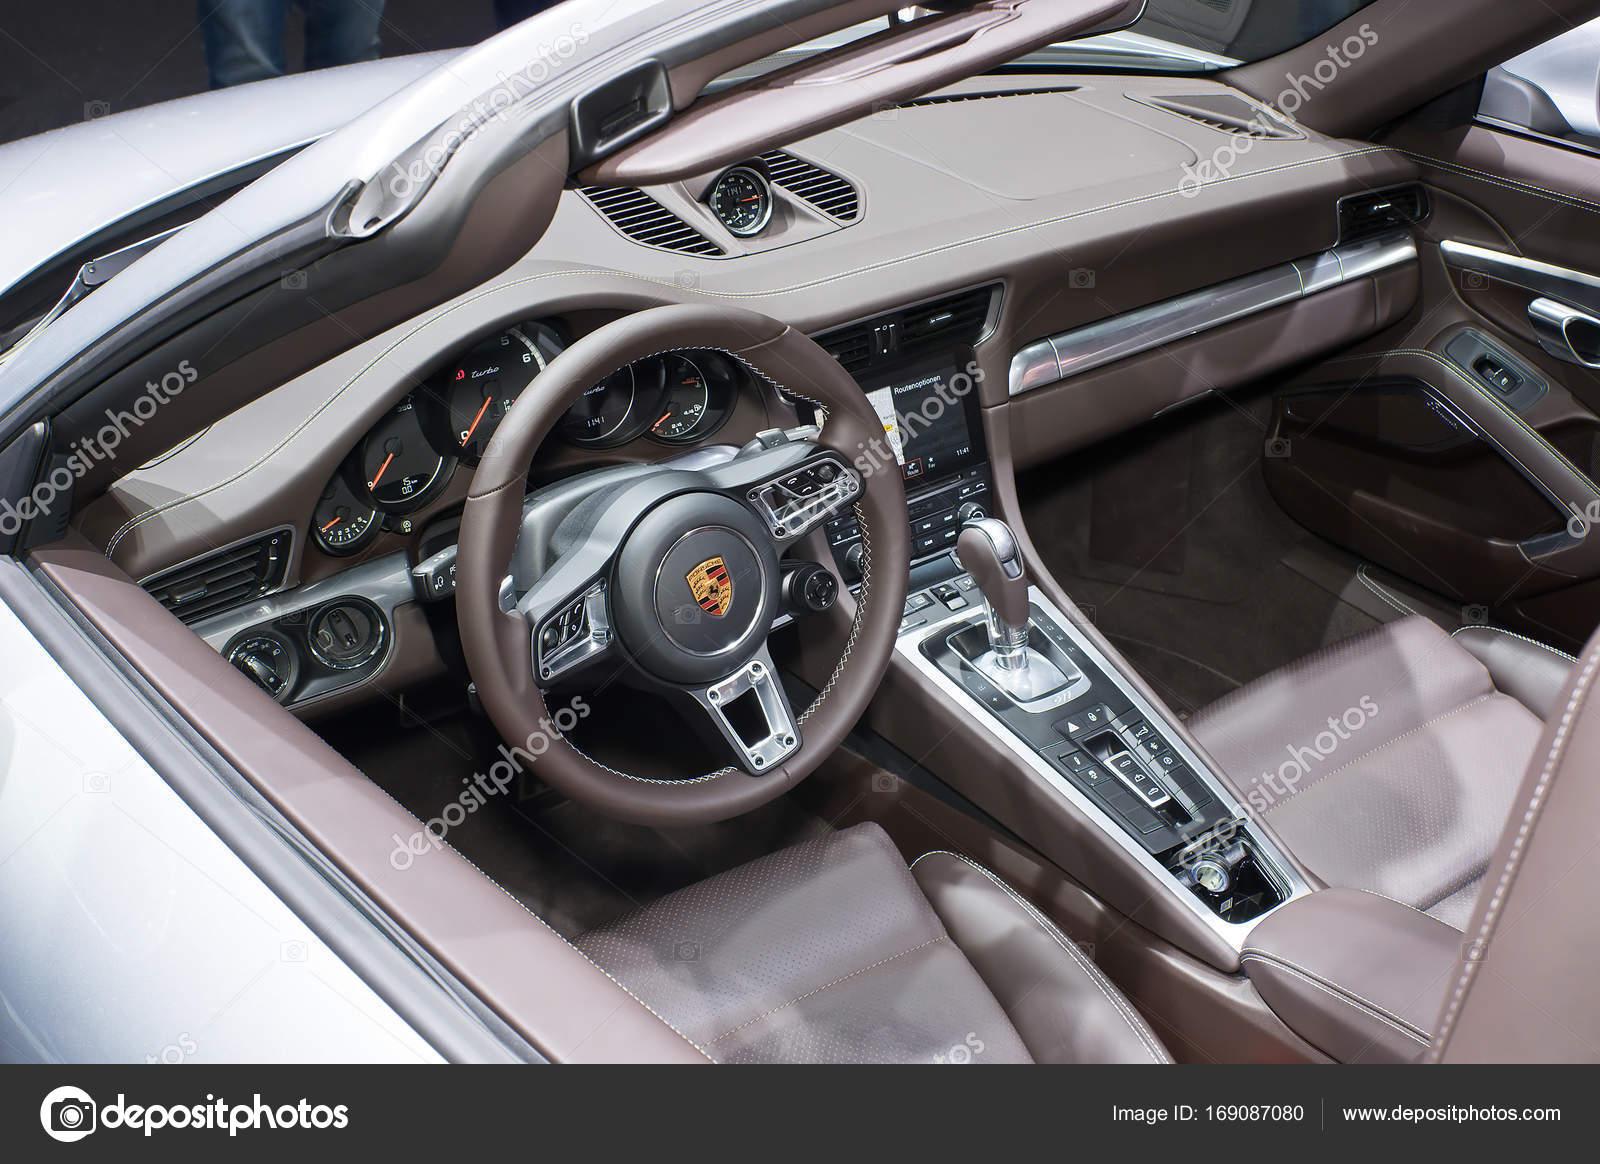 Porsche Turbo Interior on 2017 porsche 918 turbo, 2017 porsche panamera 4s, 2017 mazda rx-7 turbo, 2017 porsche boxster, 2017 porsche panamera convertible, 2017 porsche roadster, 2017 porsche panamera turbo, 2017 porsche gt3, 2017 porsche cayenne, 2017 porsche cayman, 2017 porsche gt2, 2017 porsche 918 spyder, 2016 porsche cayenne turbo, 2017 ford focus turbo, 2017 porsche panamera gts, blue 911 turbo, 2005 porsche cayenne turbo,